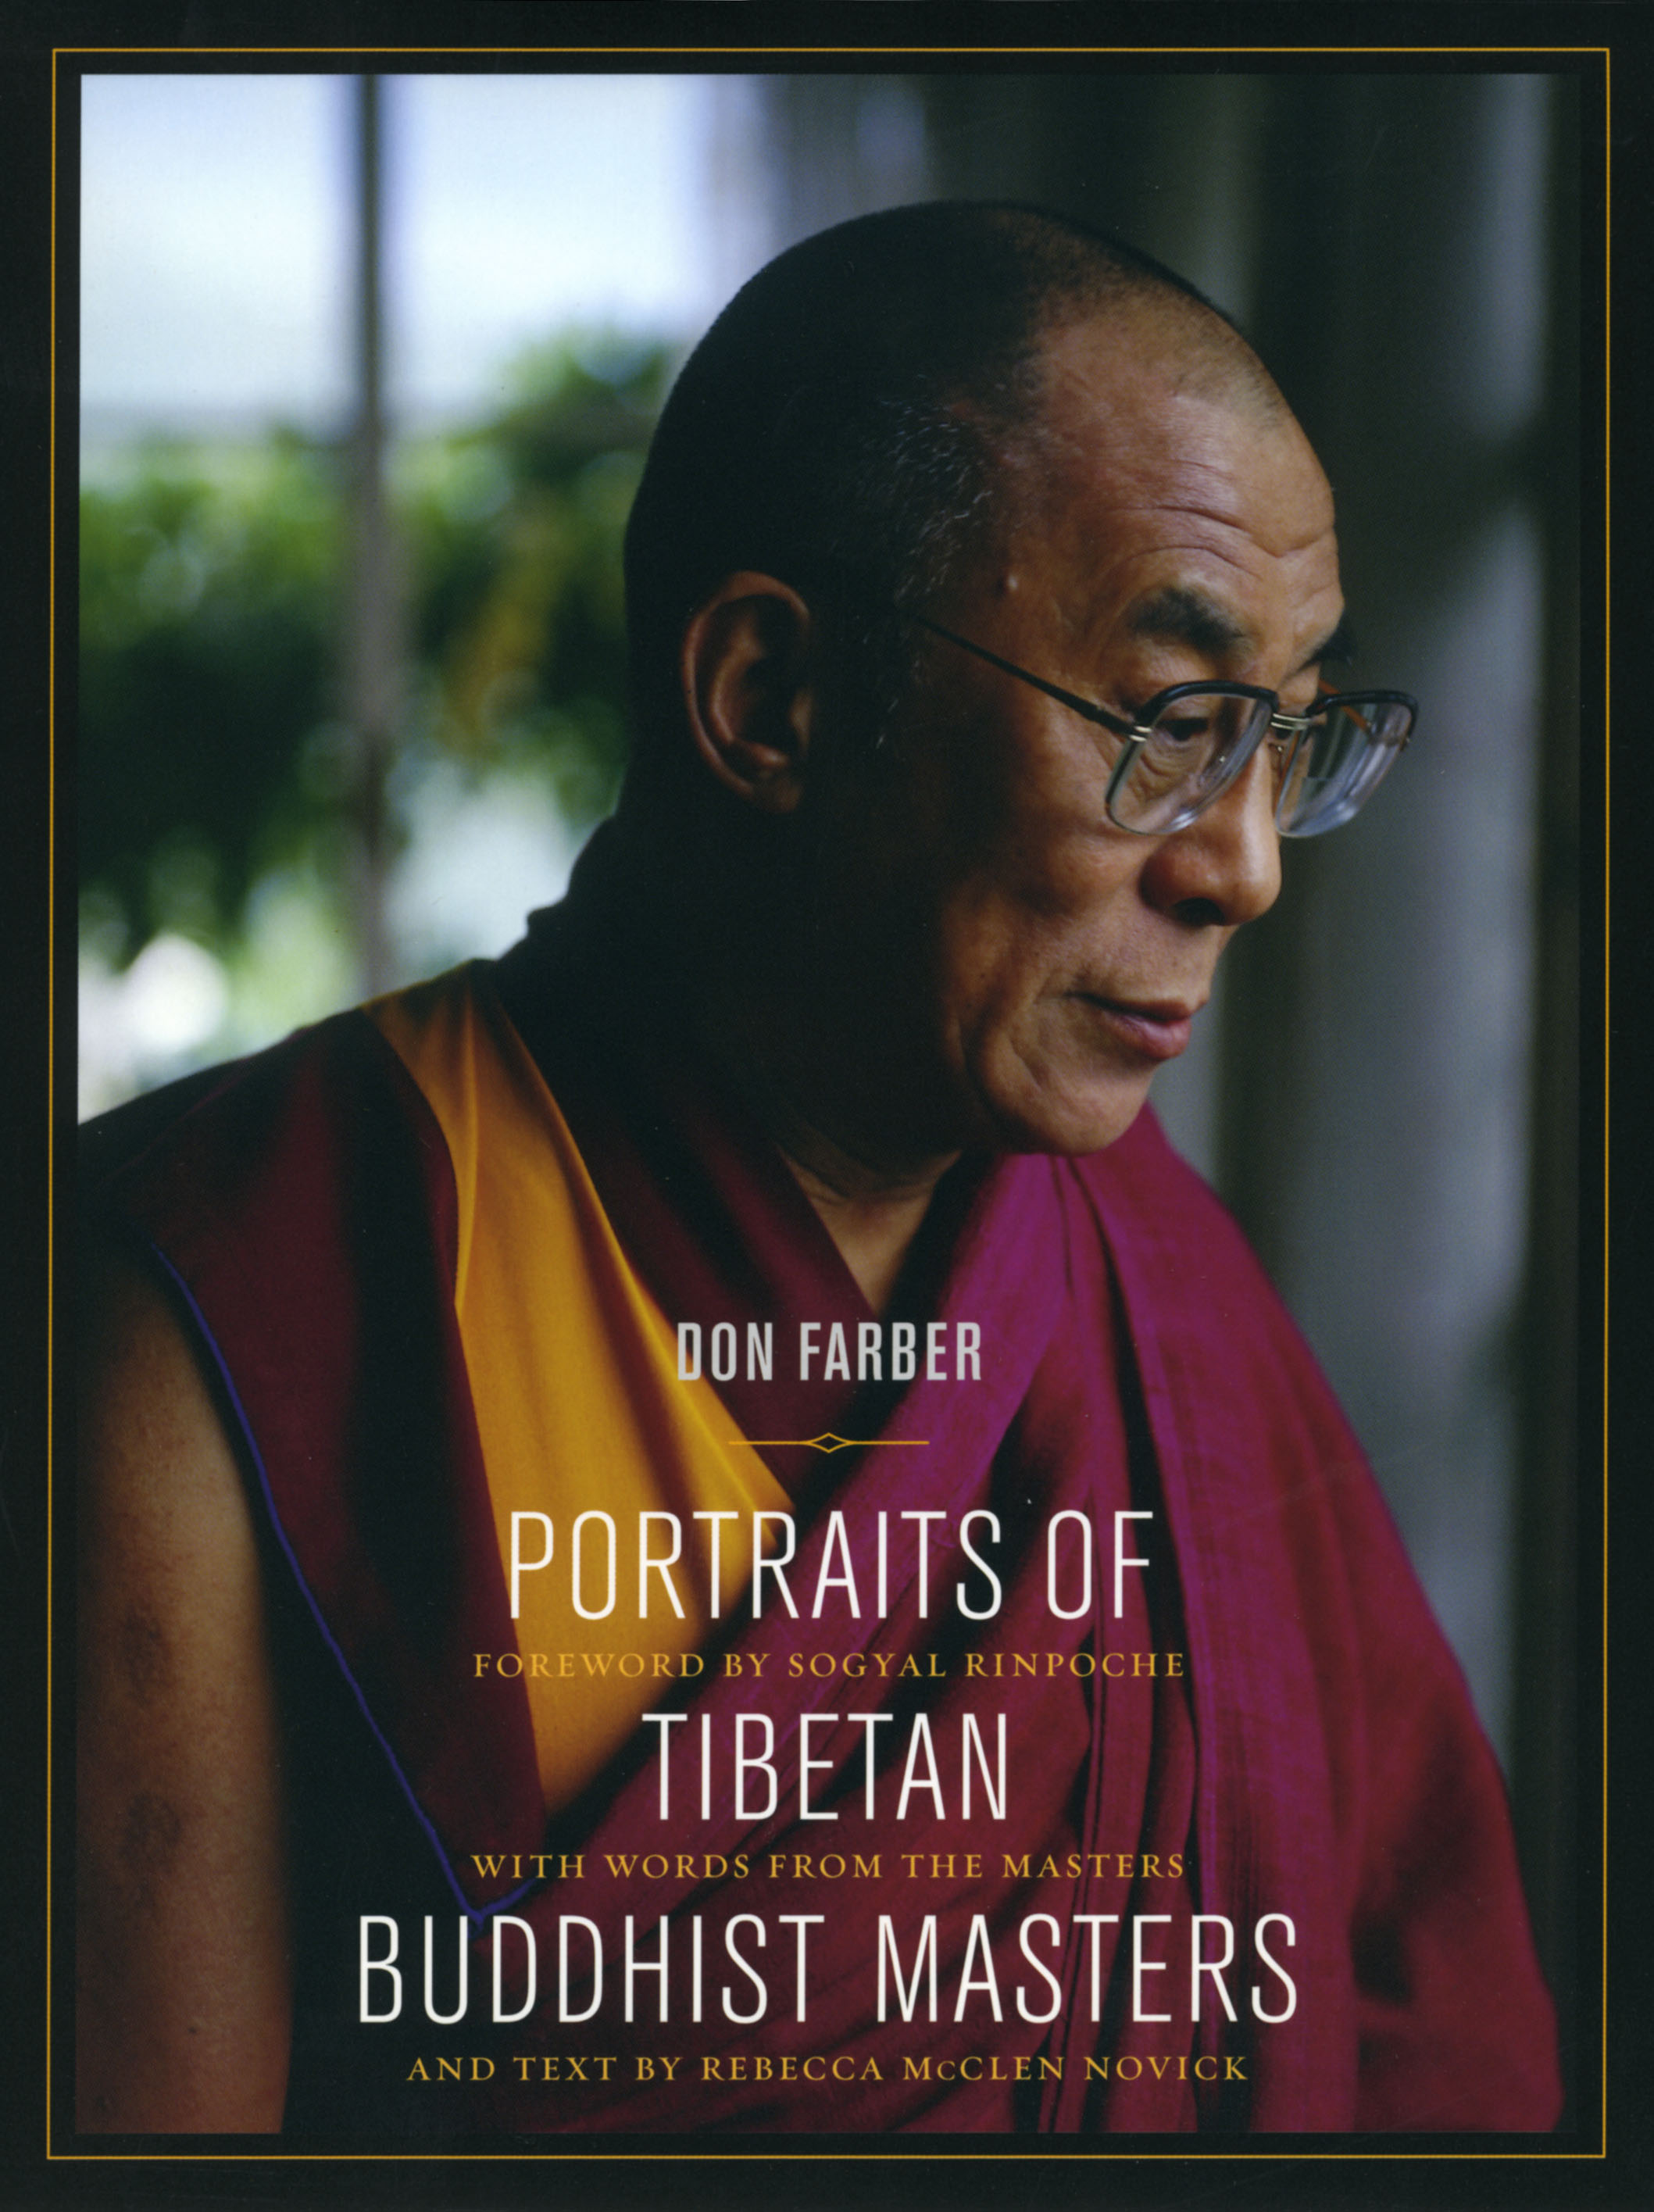 portraits-of-tibetan-buddhist-masters.jpg